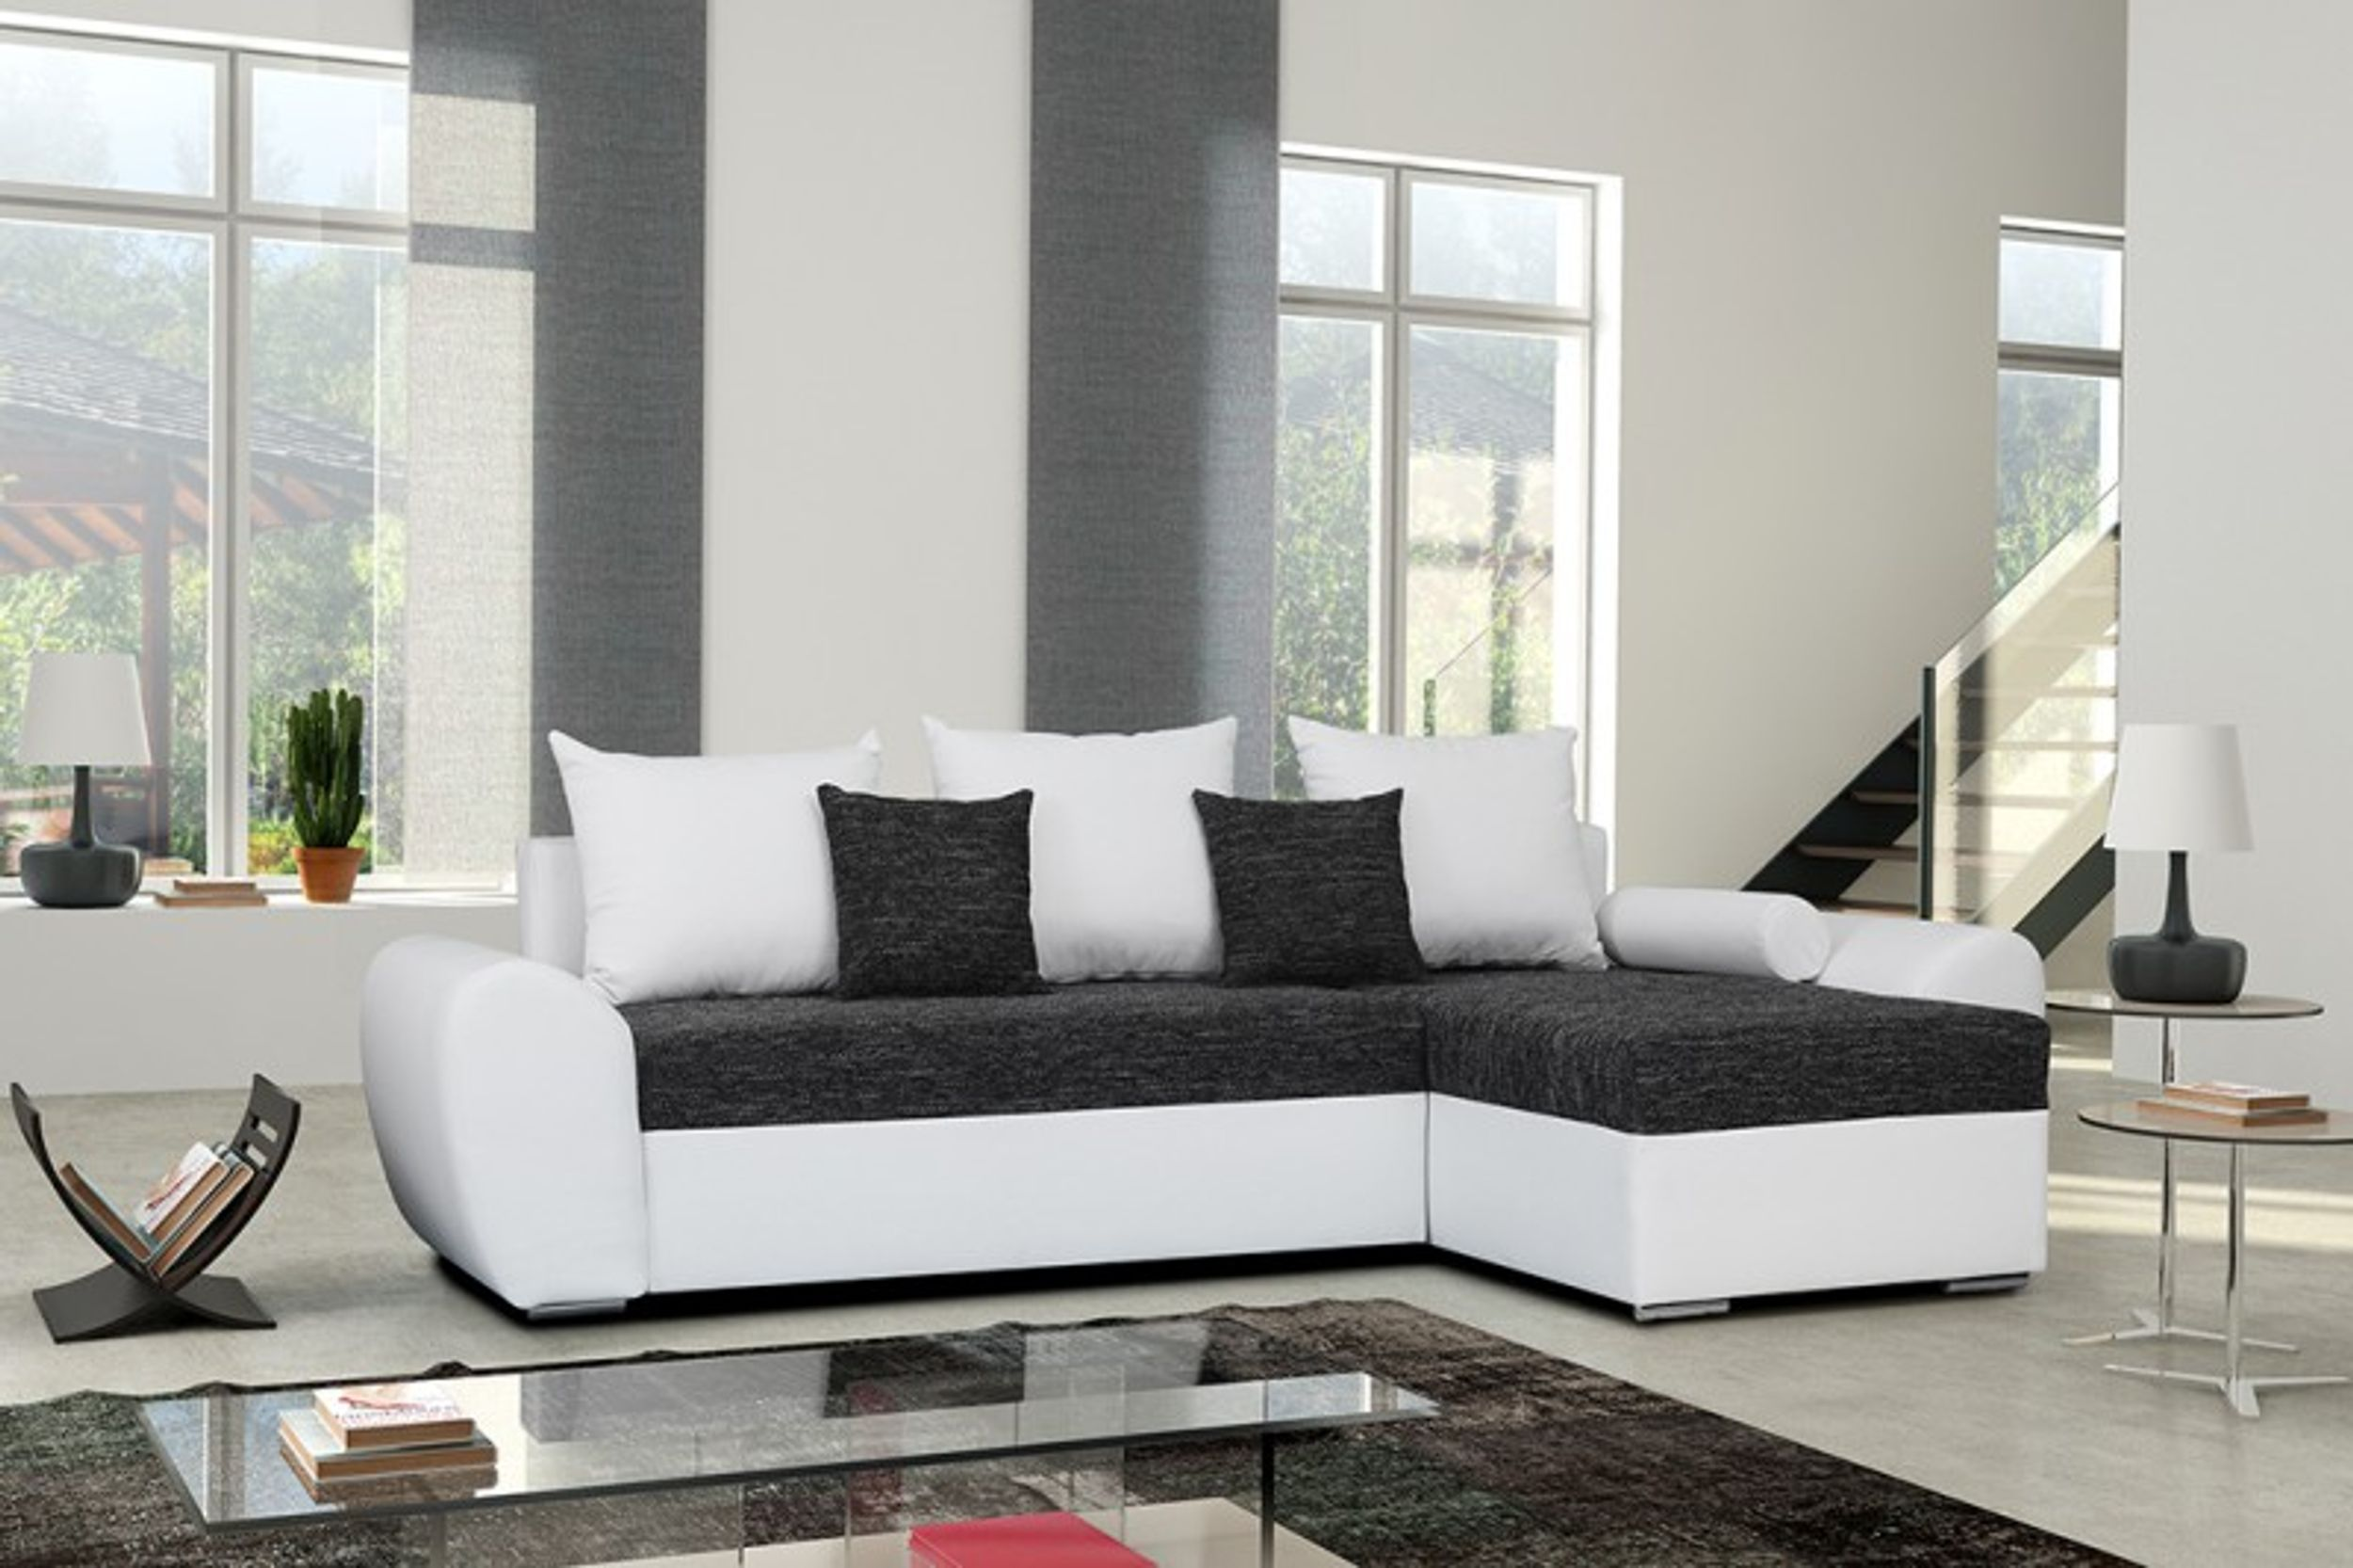 schlafsofa sofa couch ecksofa eckcouch schwarz weiss schlaffunktion ankara 1 l r polsterm bel sofa. Black Bedroom Furniture Sets. Home Design Ideas